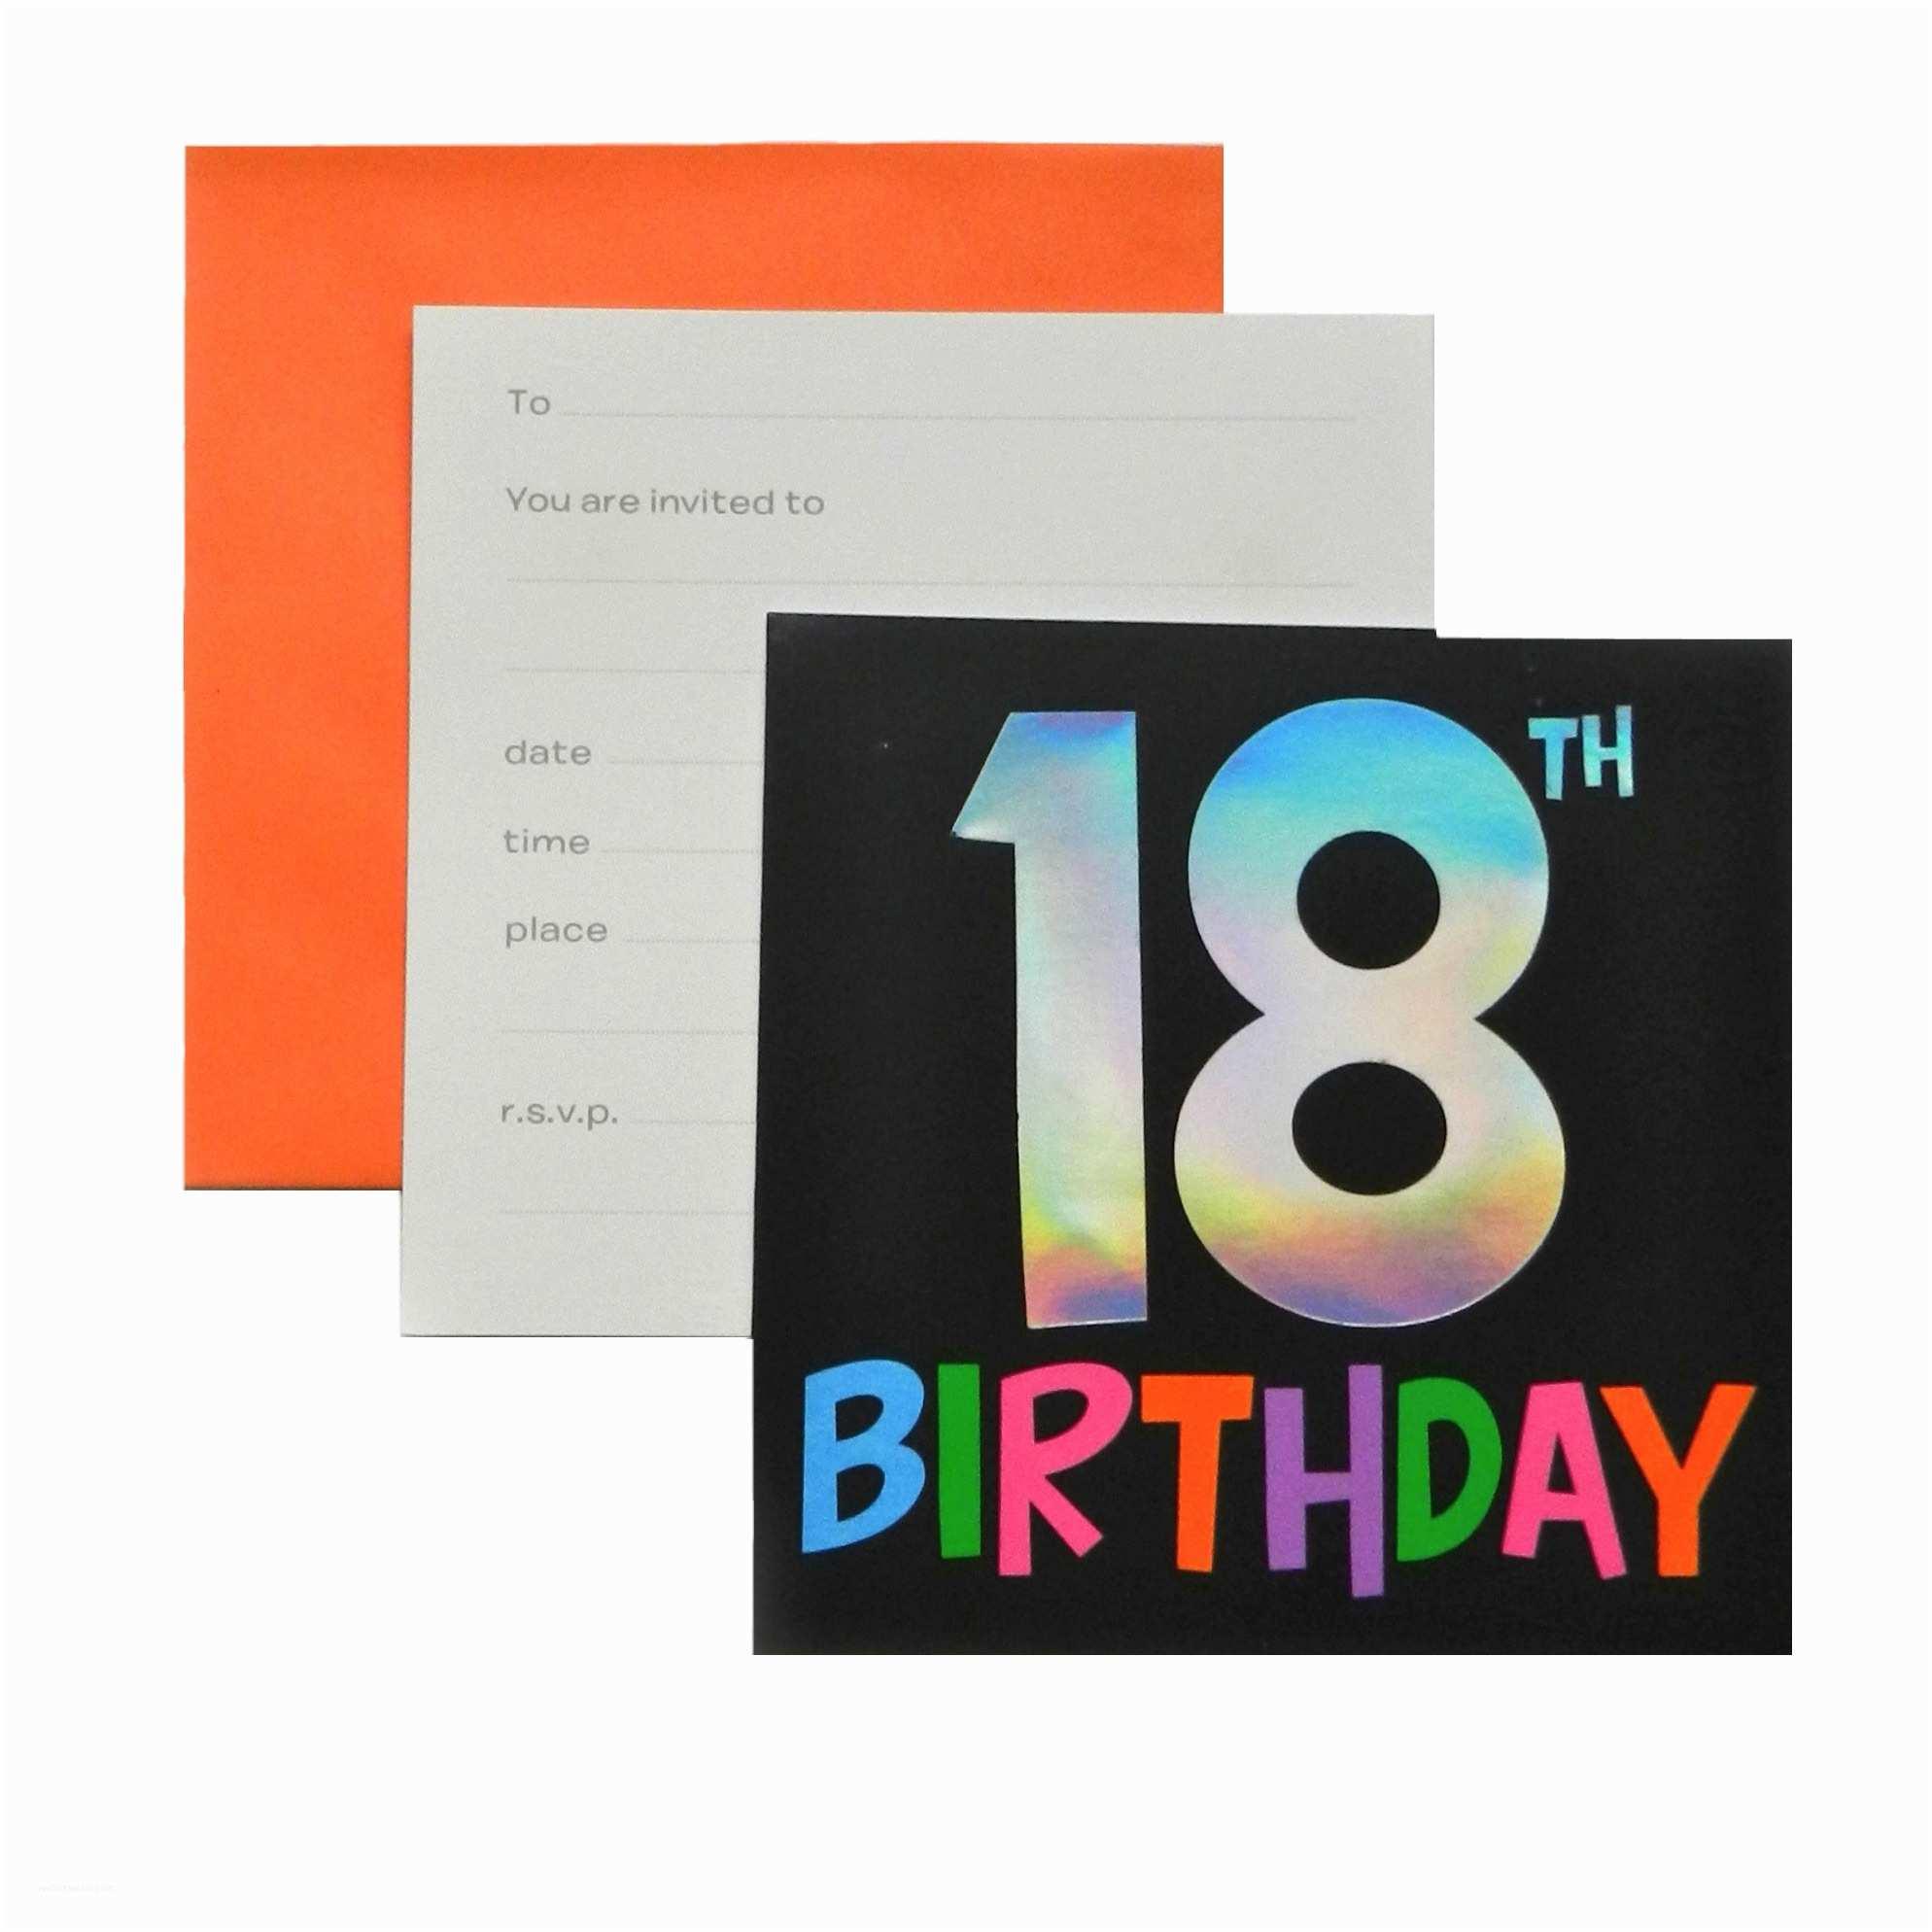 Cool Birthday Invitations 90th Birthday Invitation Cards Beautiful 90 Birthday